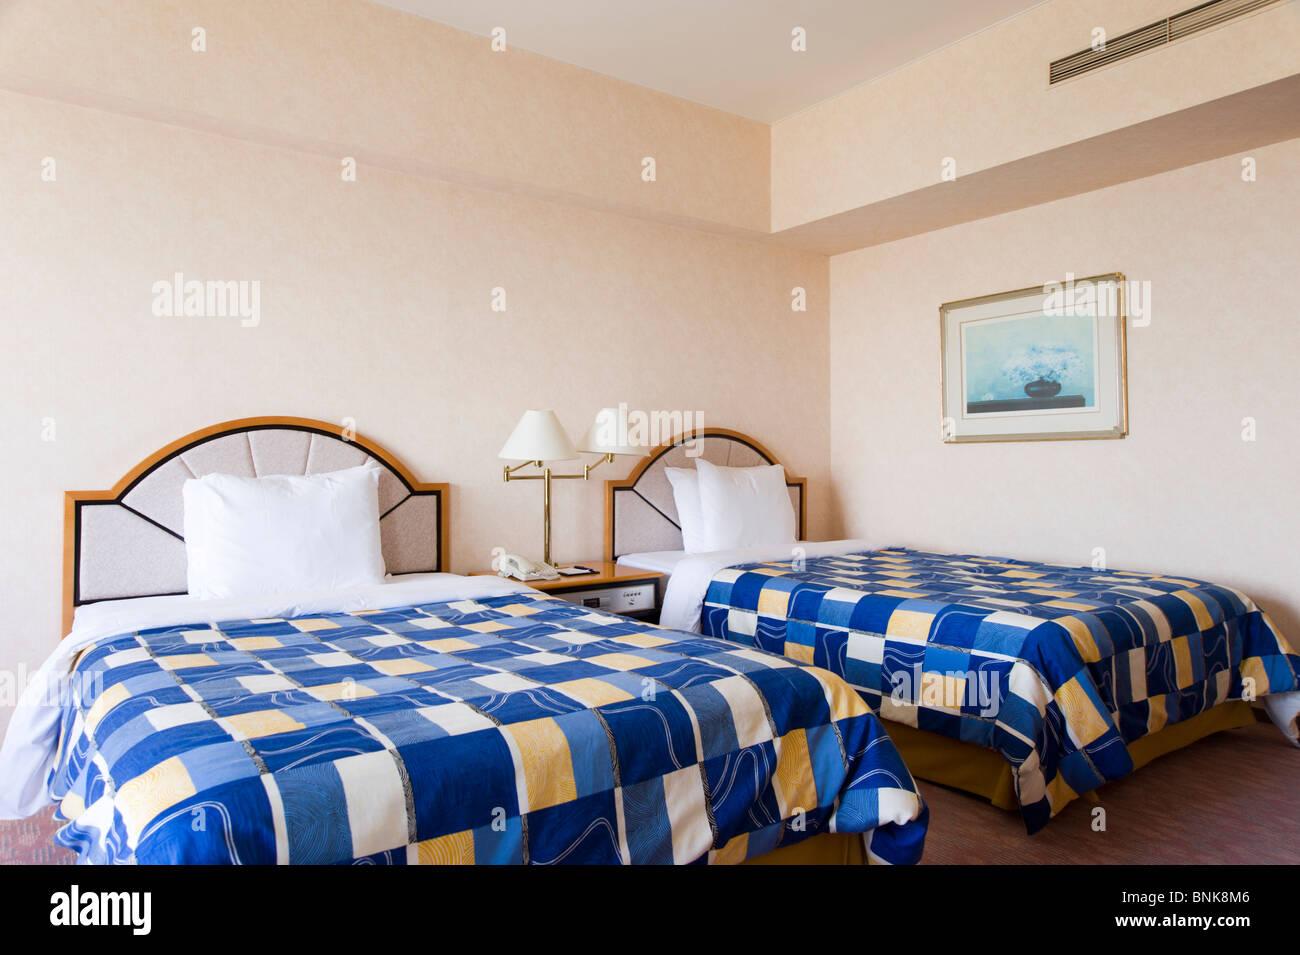 Hilton Hotel chambre avec lits jumeaux Photo Stock